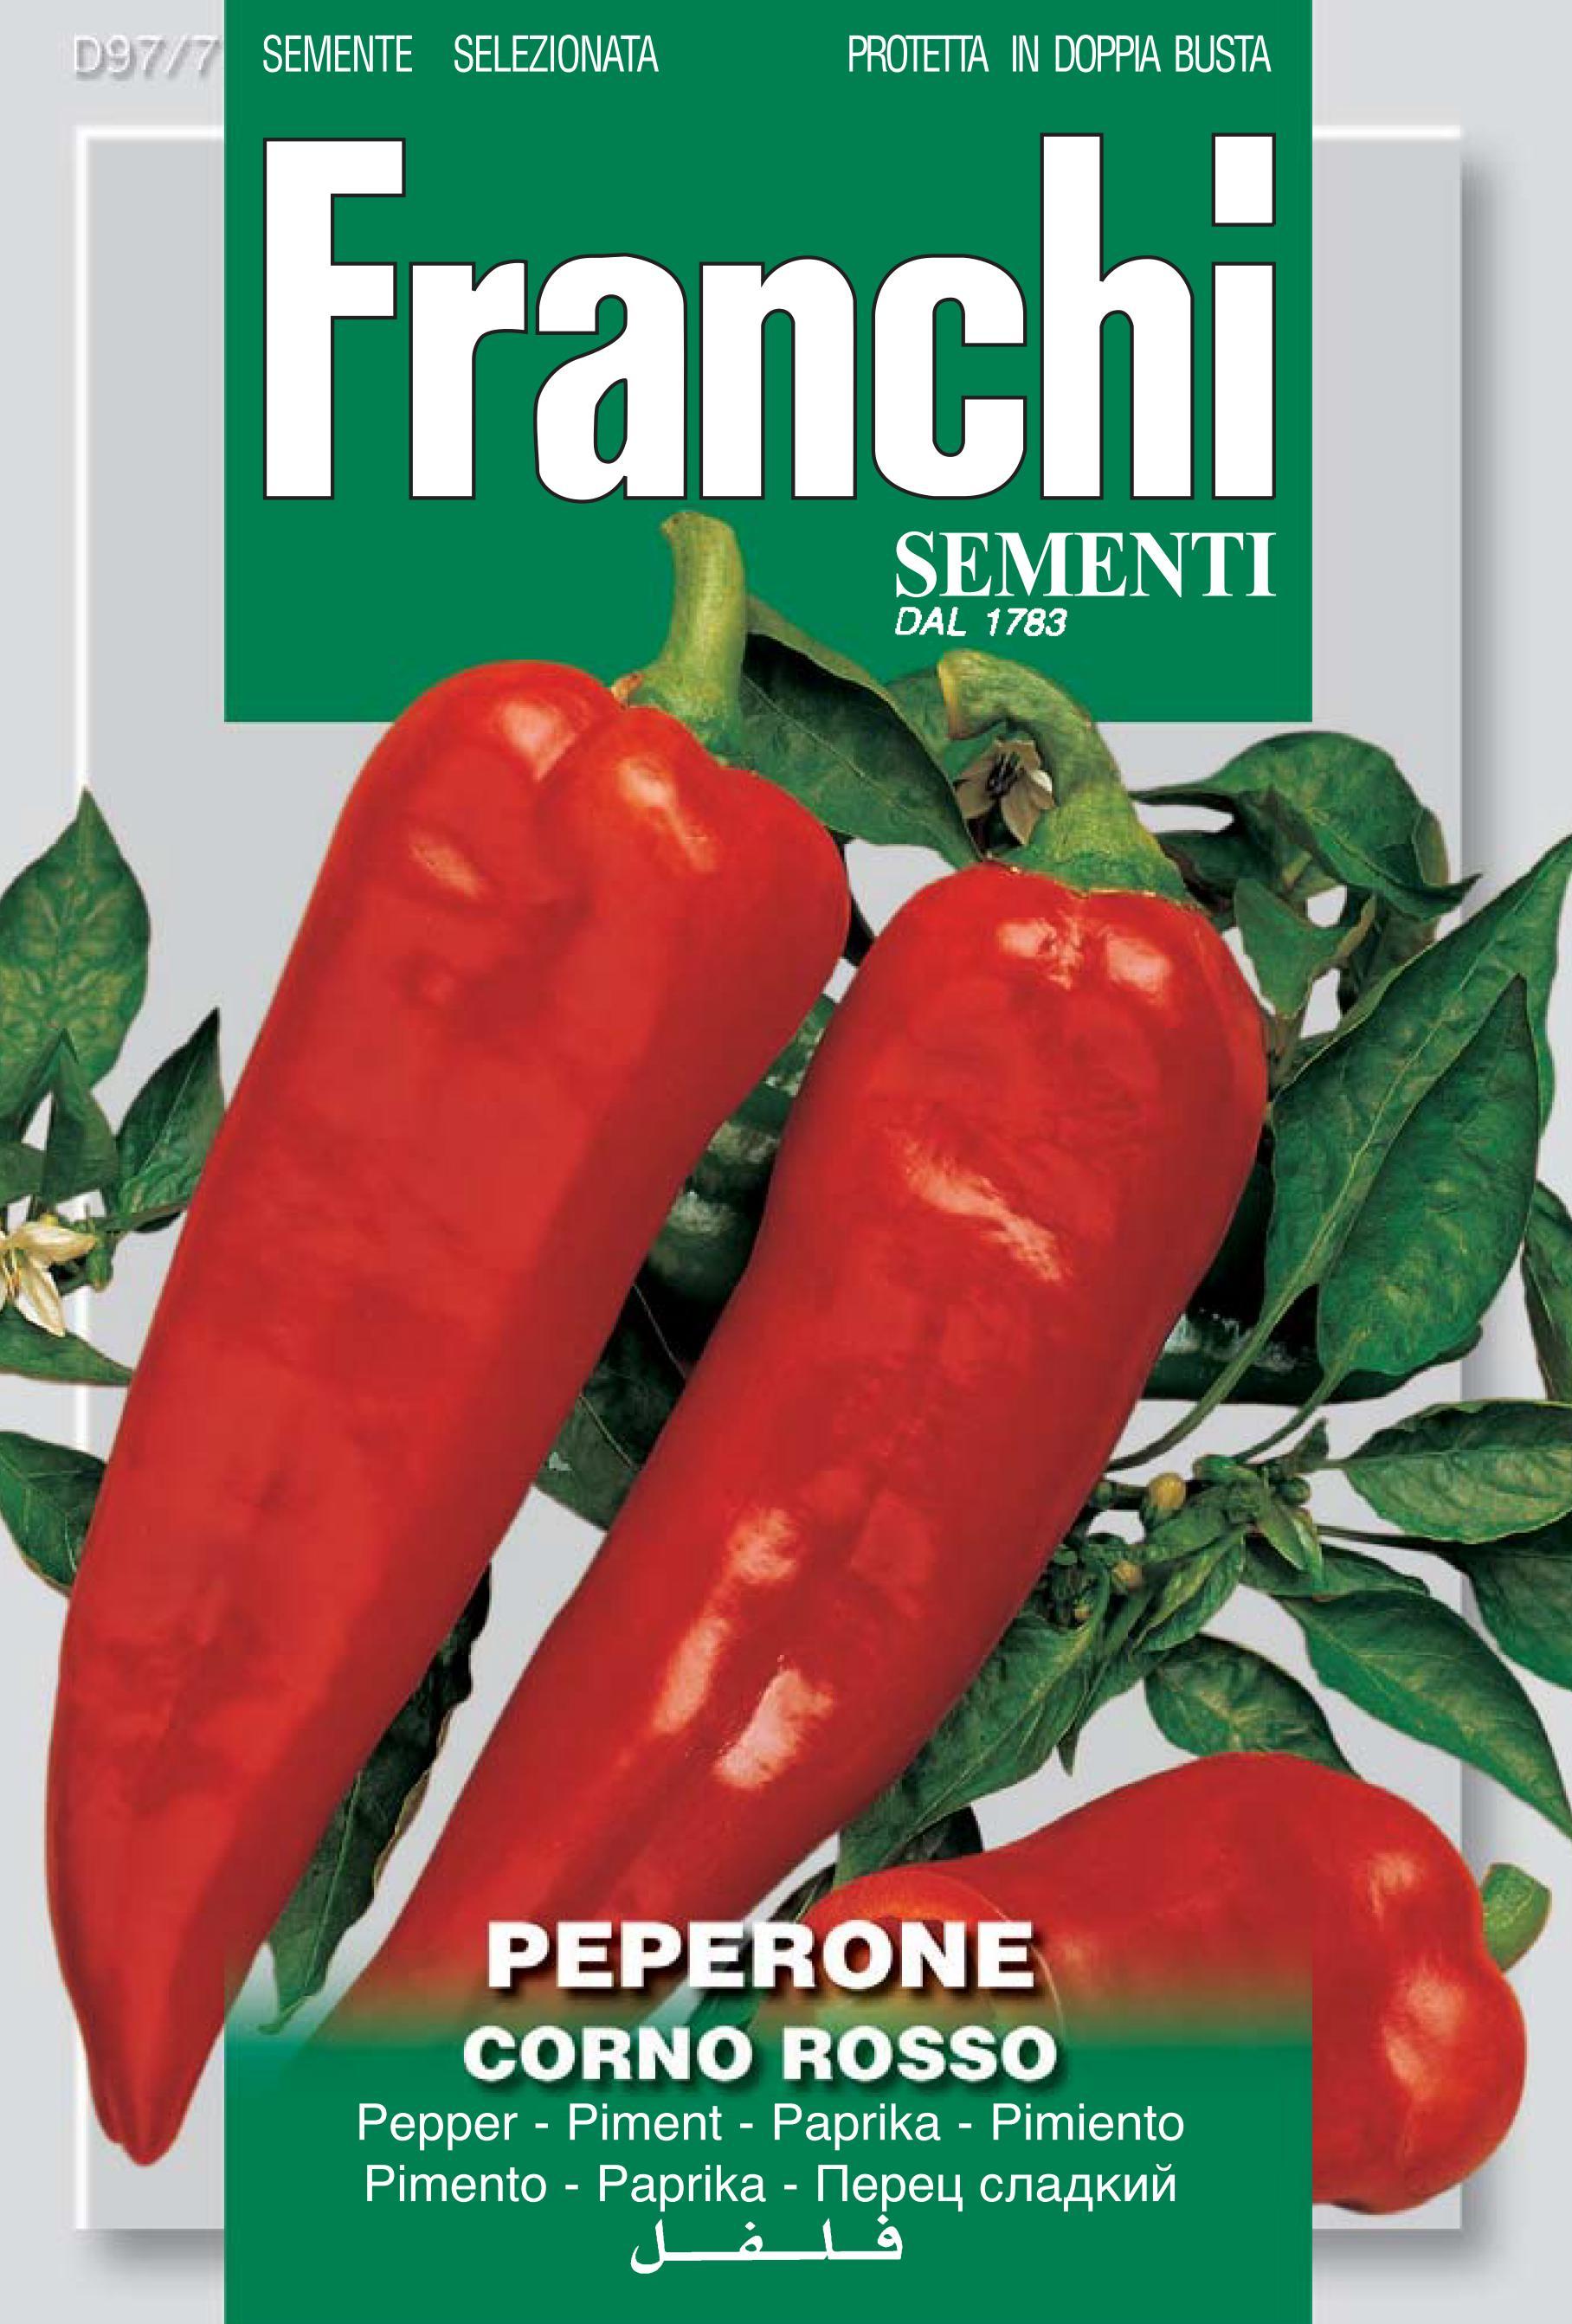 Pepper Corno Rosso (A) Capsicum annuum L.